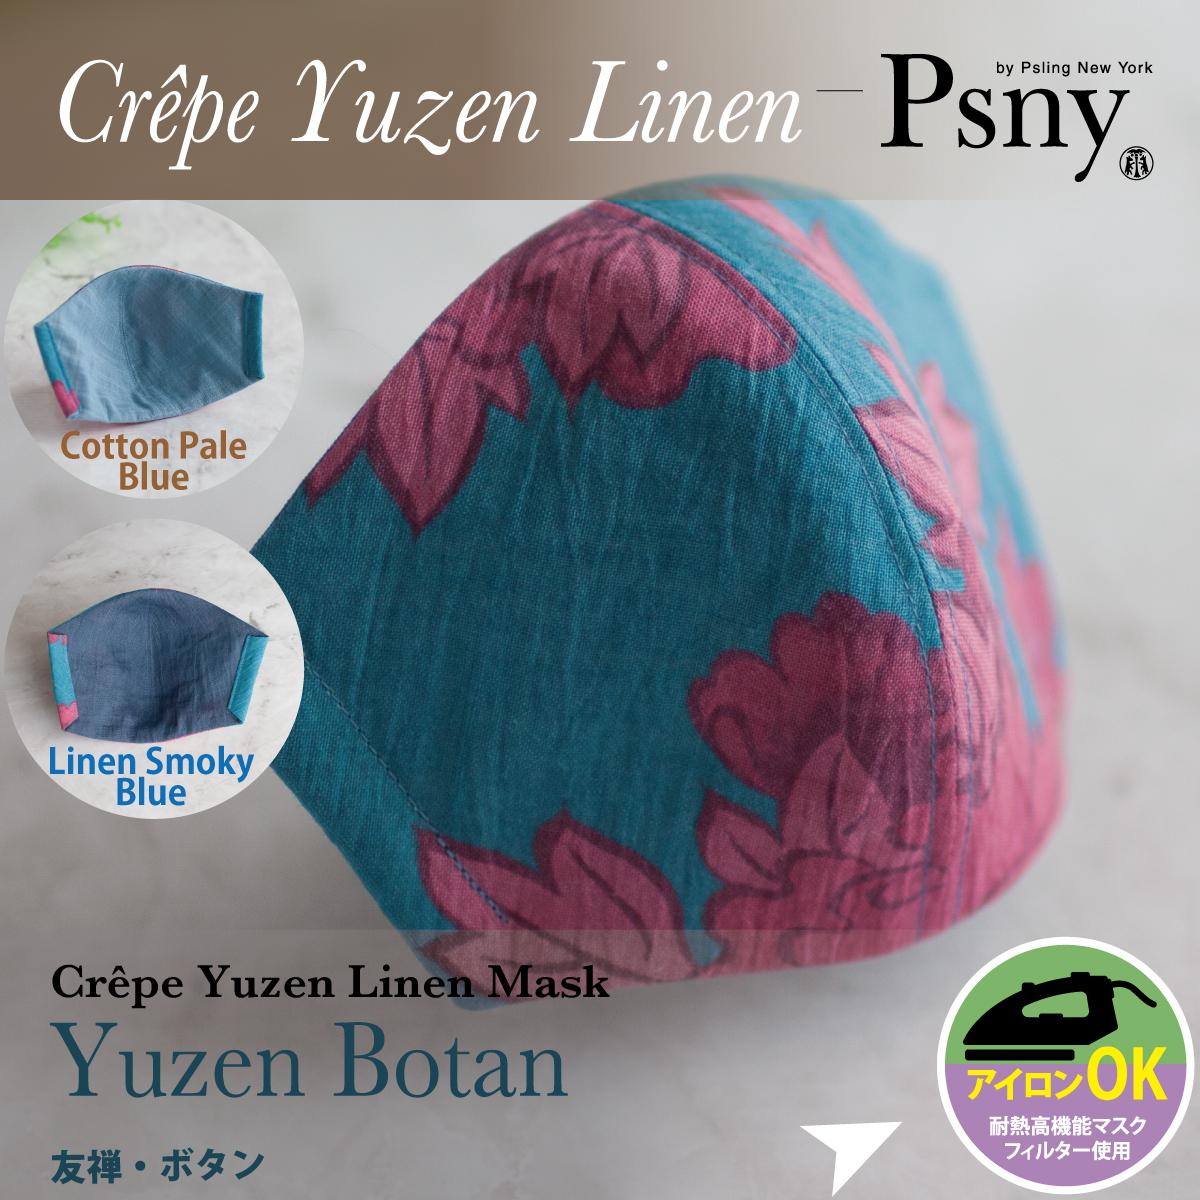 PSNY 友禅マスク・ピースリング・ボタン 花粉 黄砂 洗える不織布フィルター入り 立体 大人用 マスク 送料無料 Y02